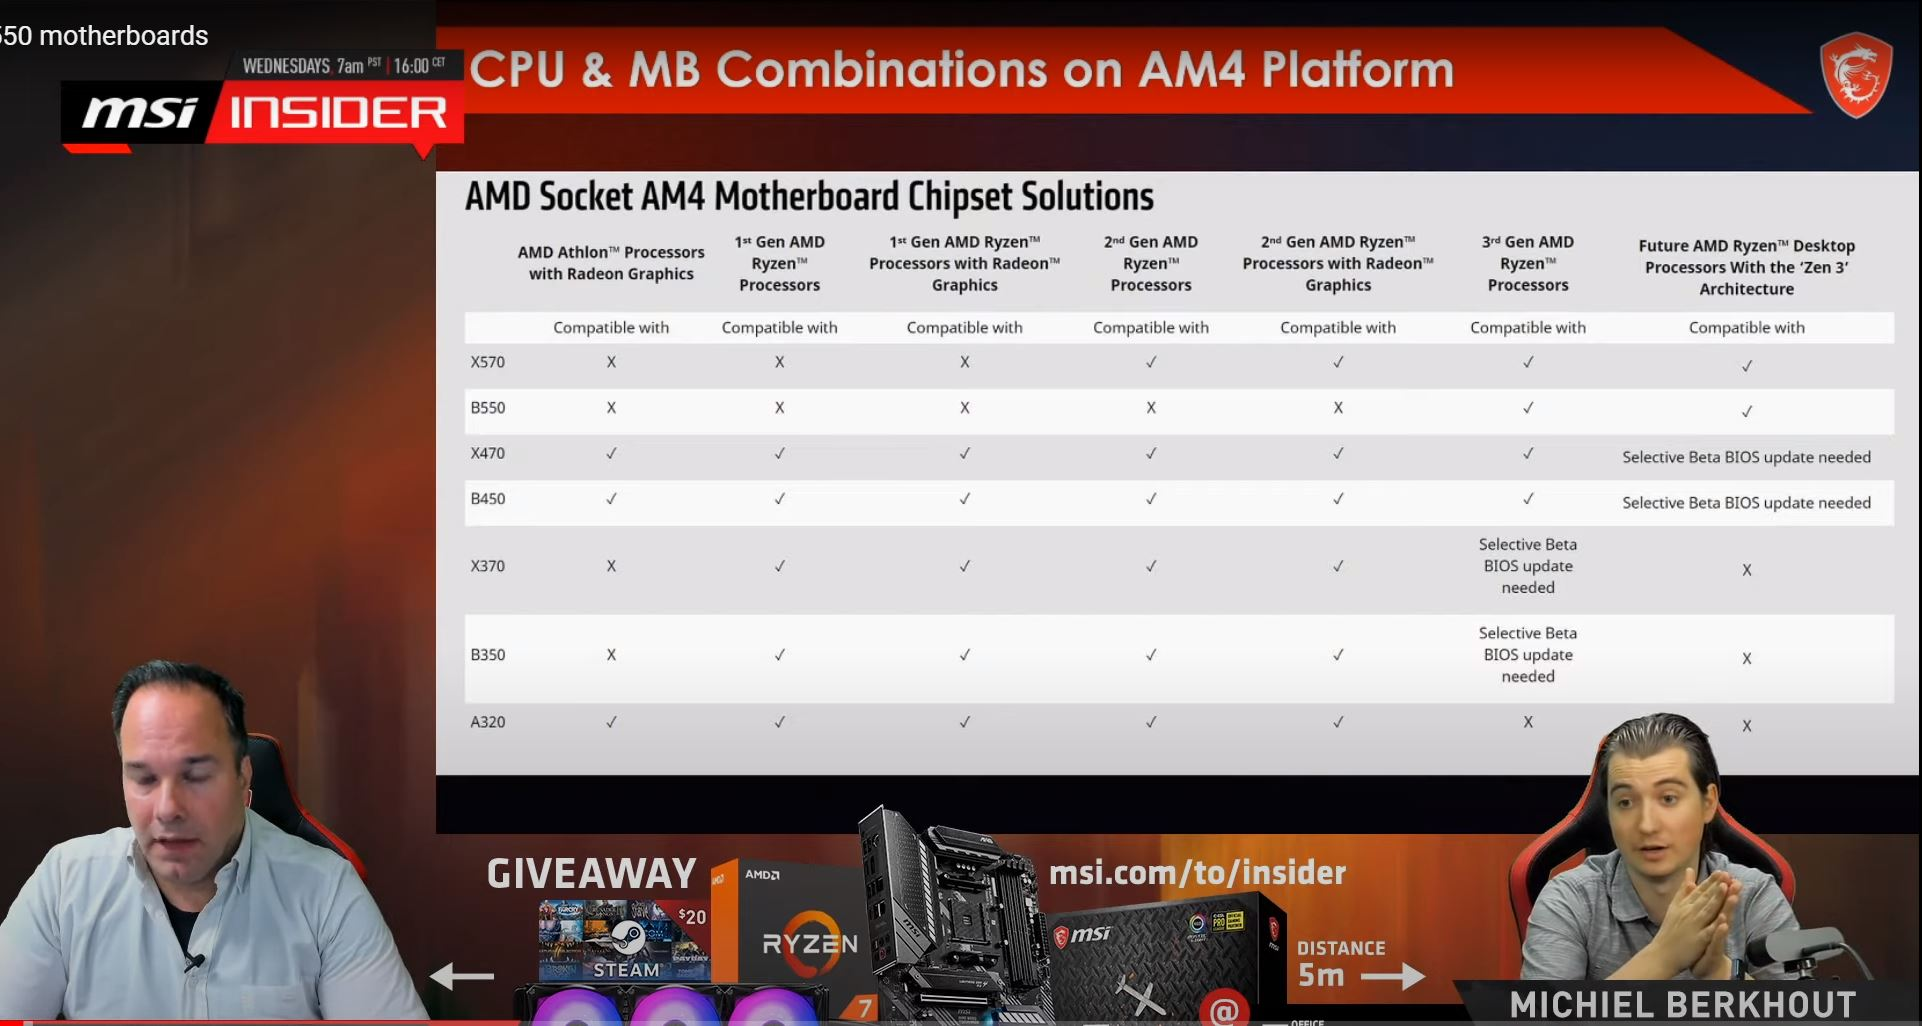 Msi Confirms Amd Ryzen 4000 Zen 3 Support On 400 Series Boards